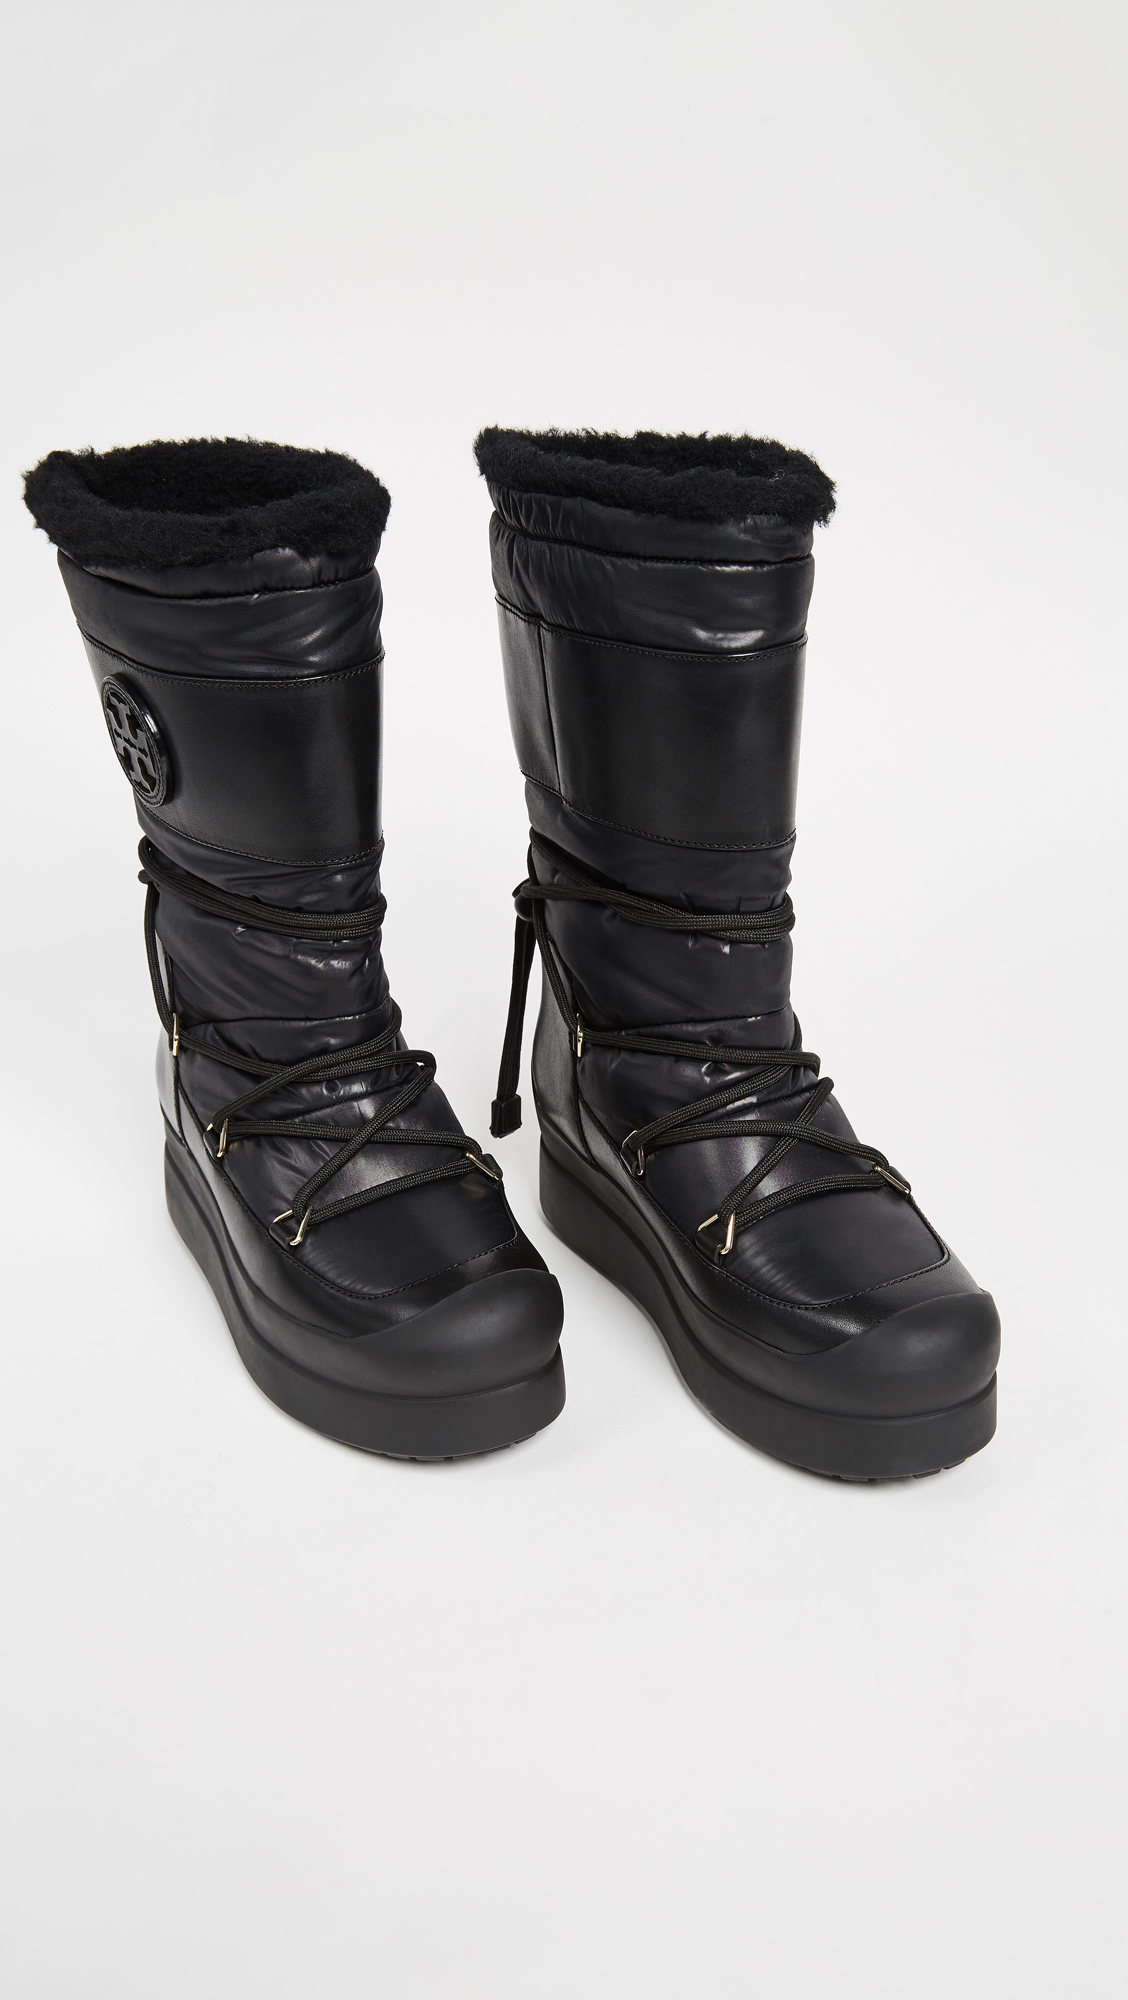 c13cf4ba062e Tory Burch Cliff Snow Boots